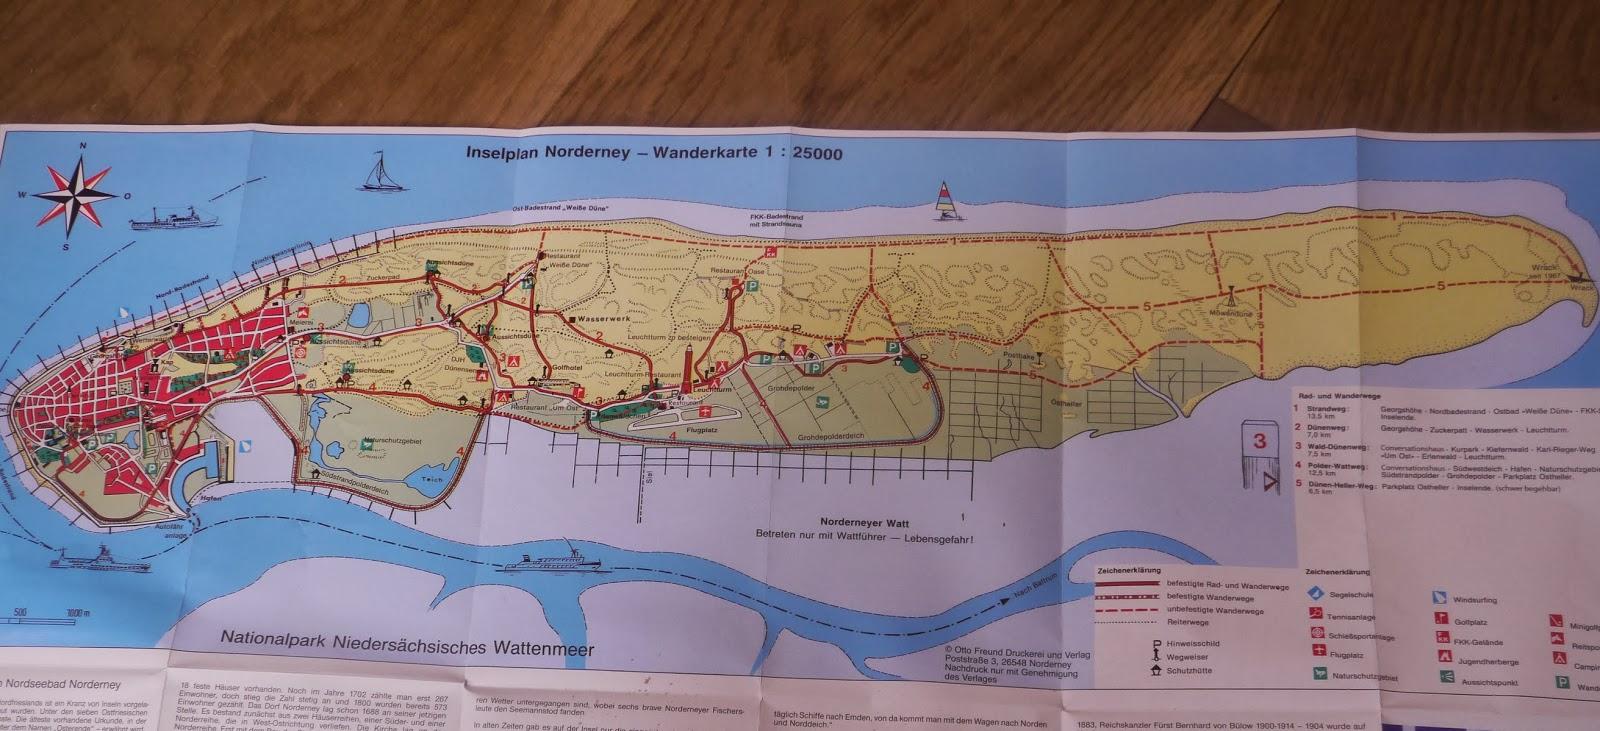 Norderney Karte Straßen.Reise Blog Heike